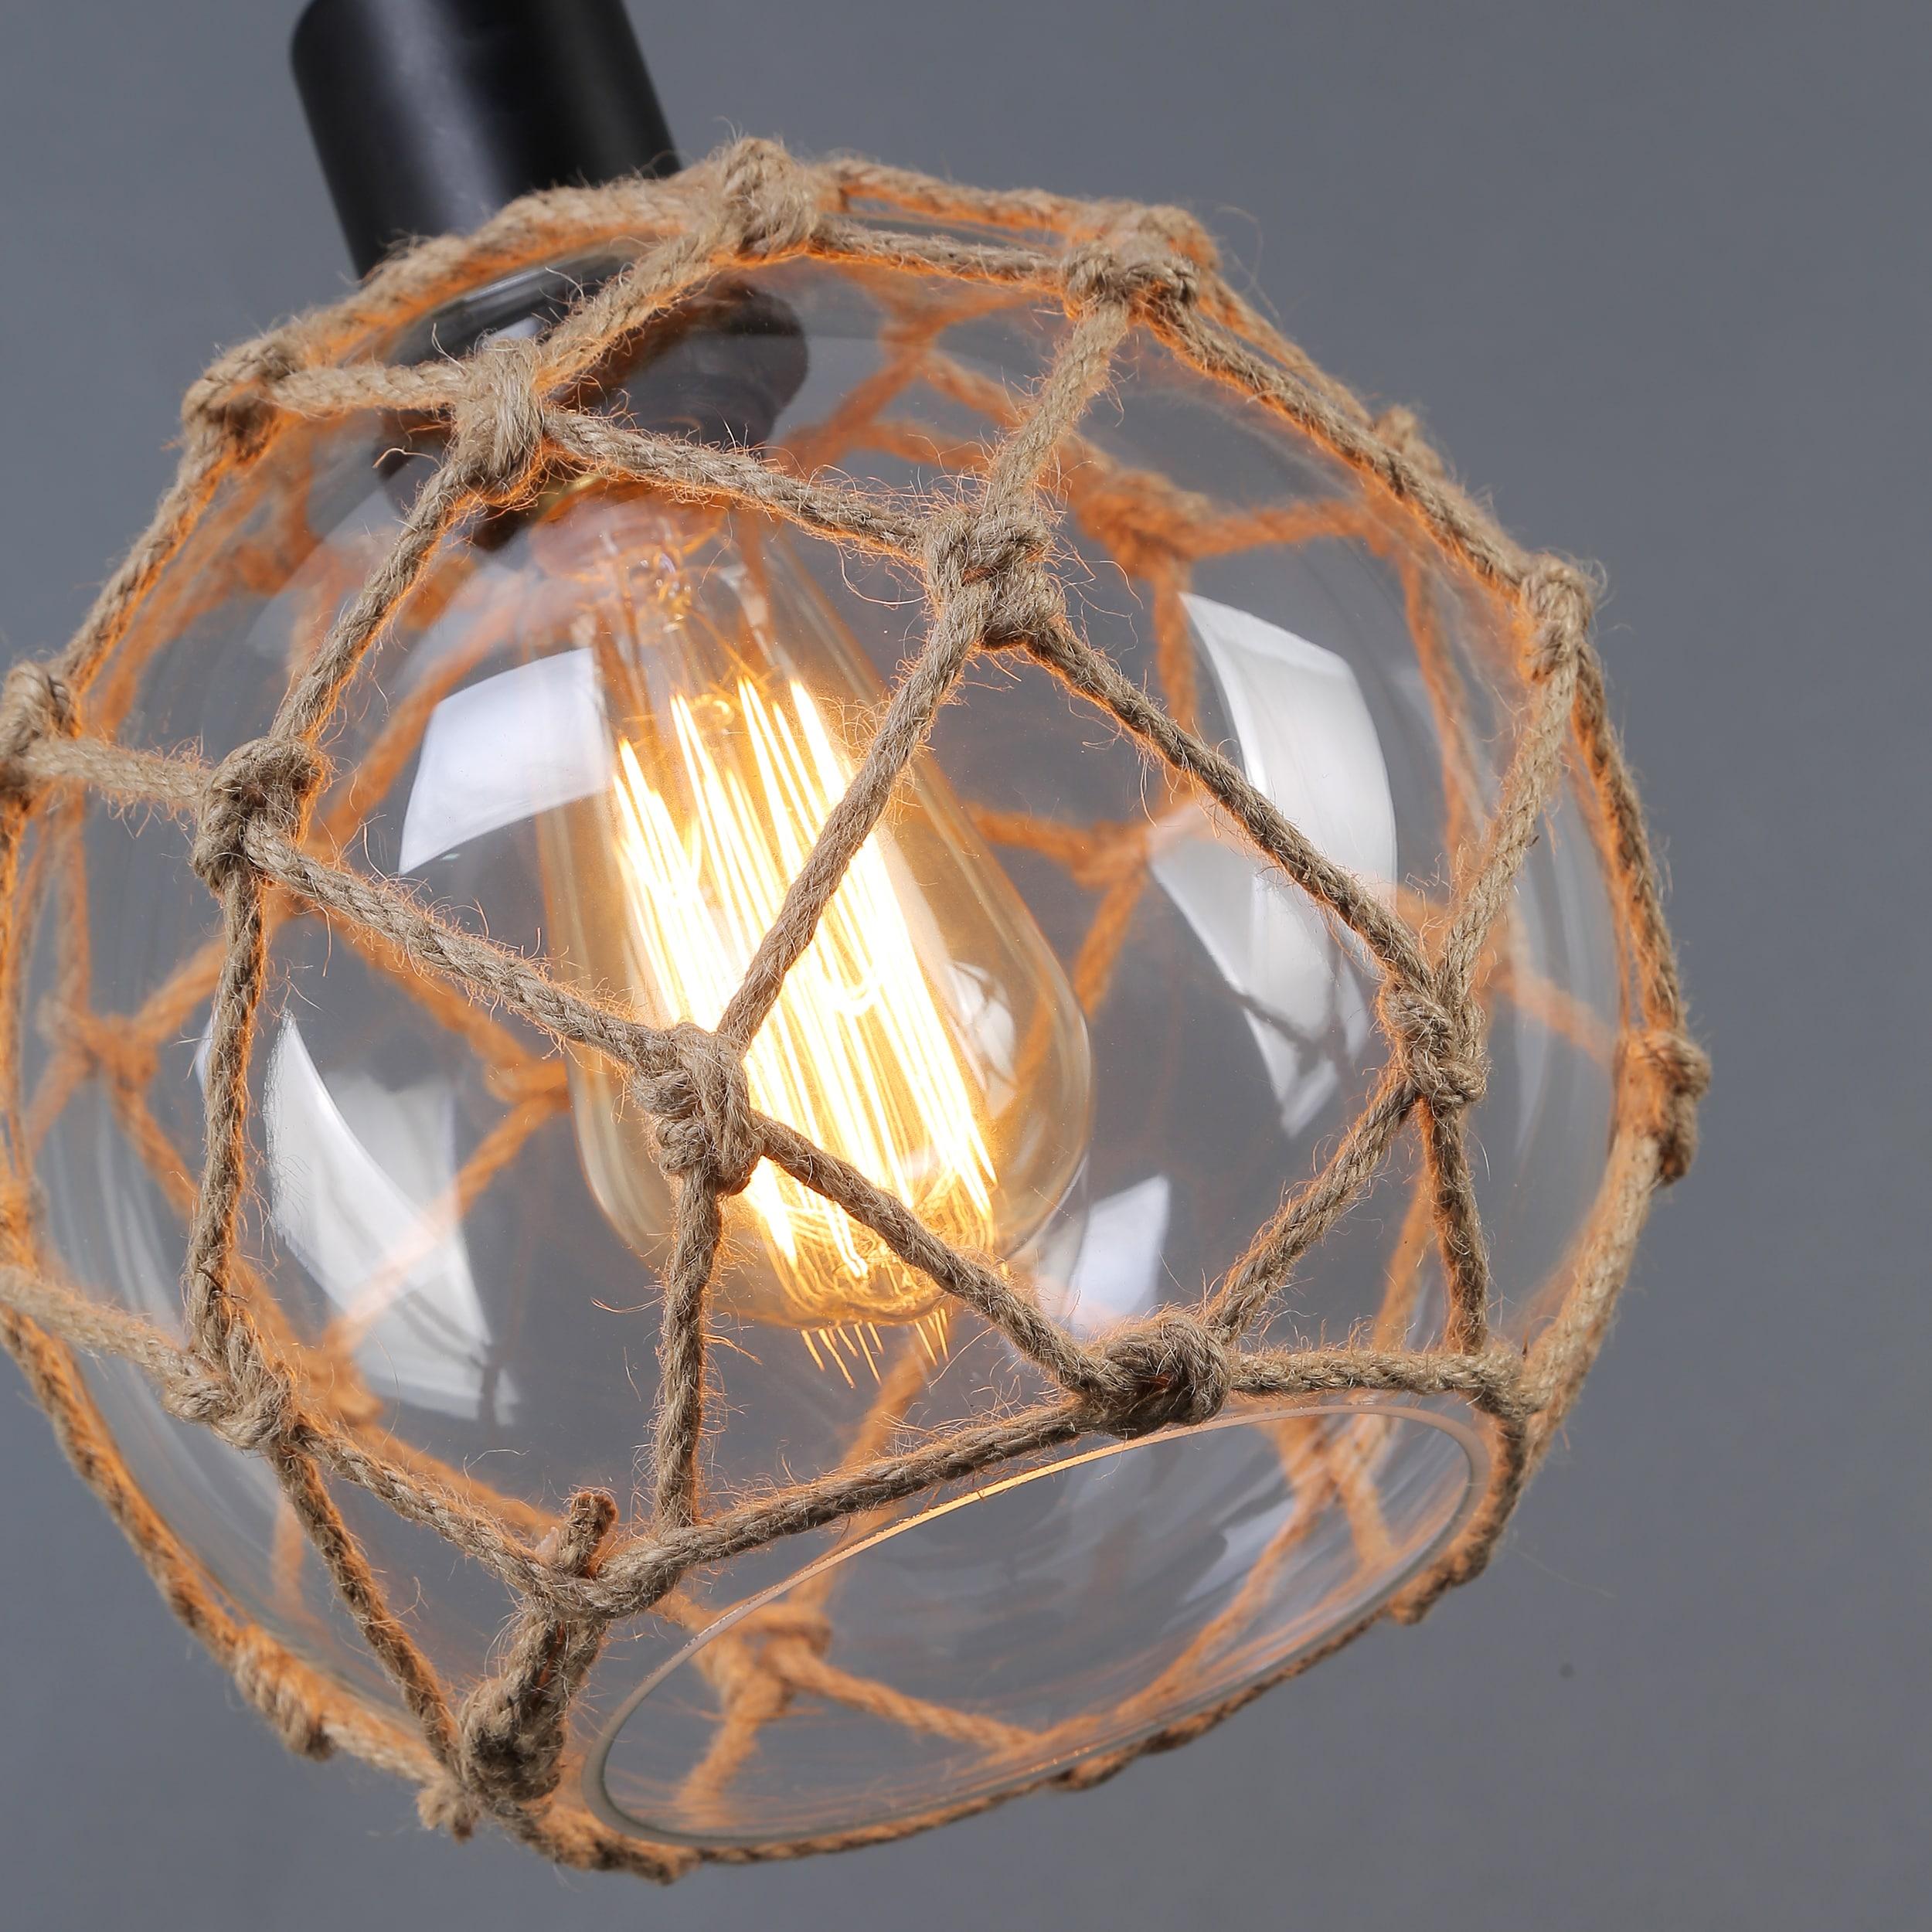 journee lighting. Journee Home \u0027Nura\u0027 8 In Hard Wired Glass Hemp Net Pendant Light - Free Shipping Today Overstock 20677831 Lighting L